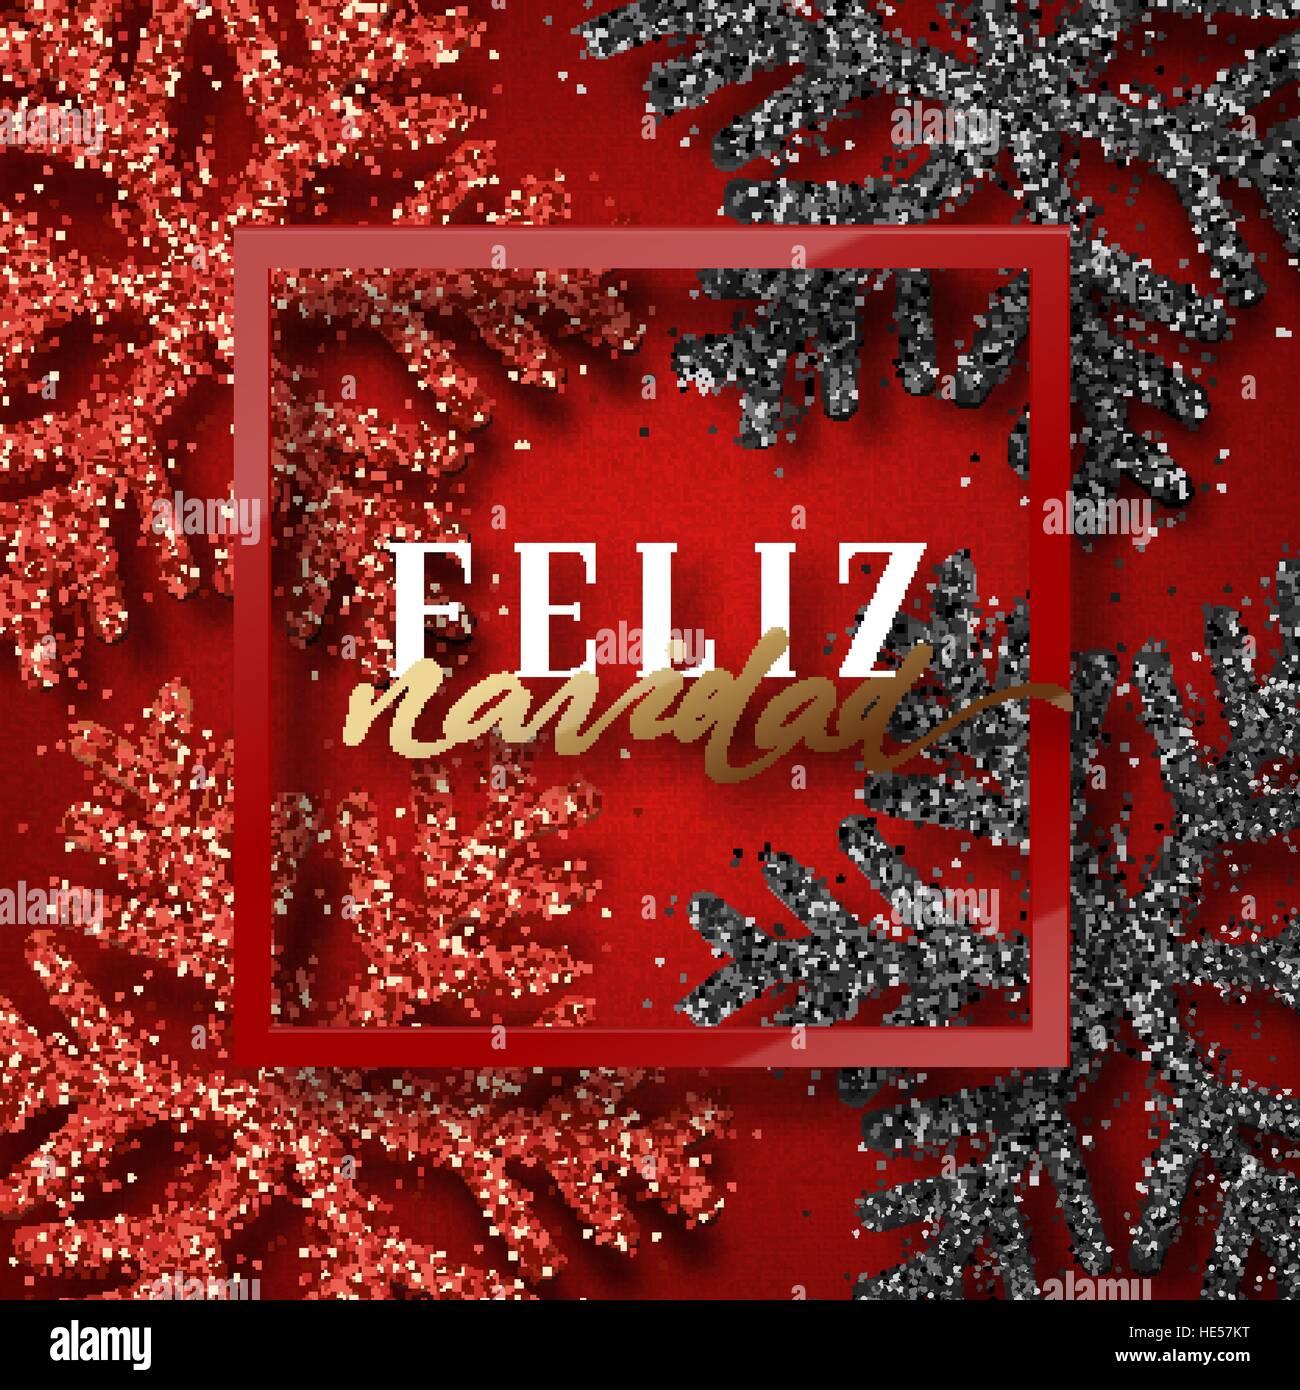 Merry Christmas In Spanish.Merry Christmas Spanish Inscription Feliz Navidad Stock